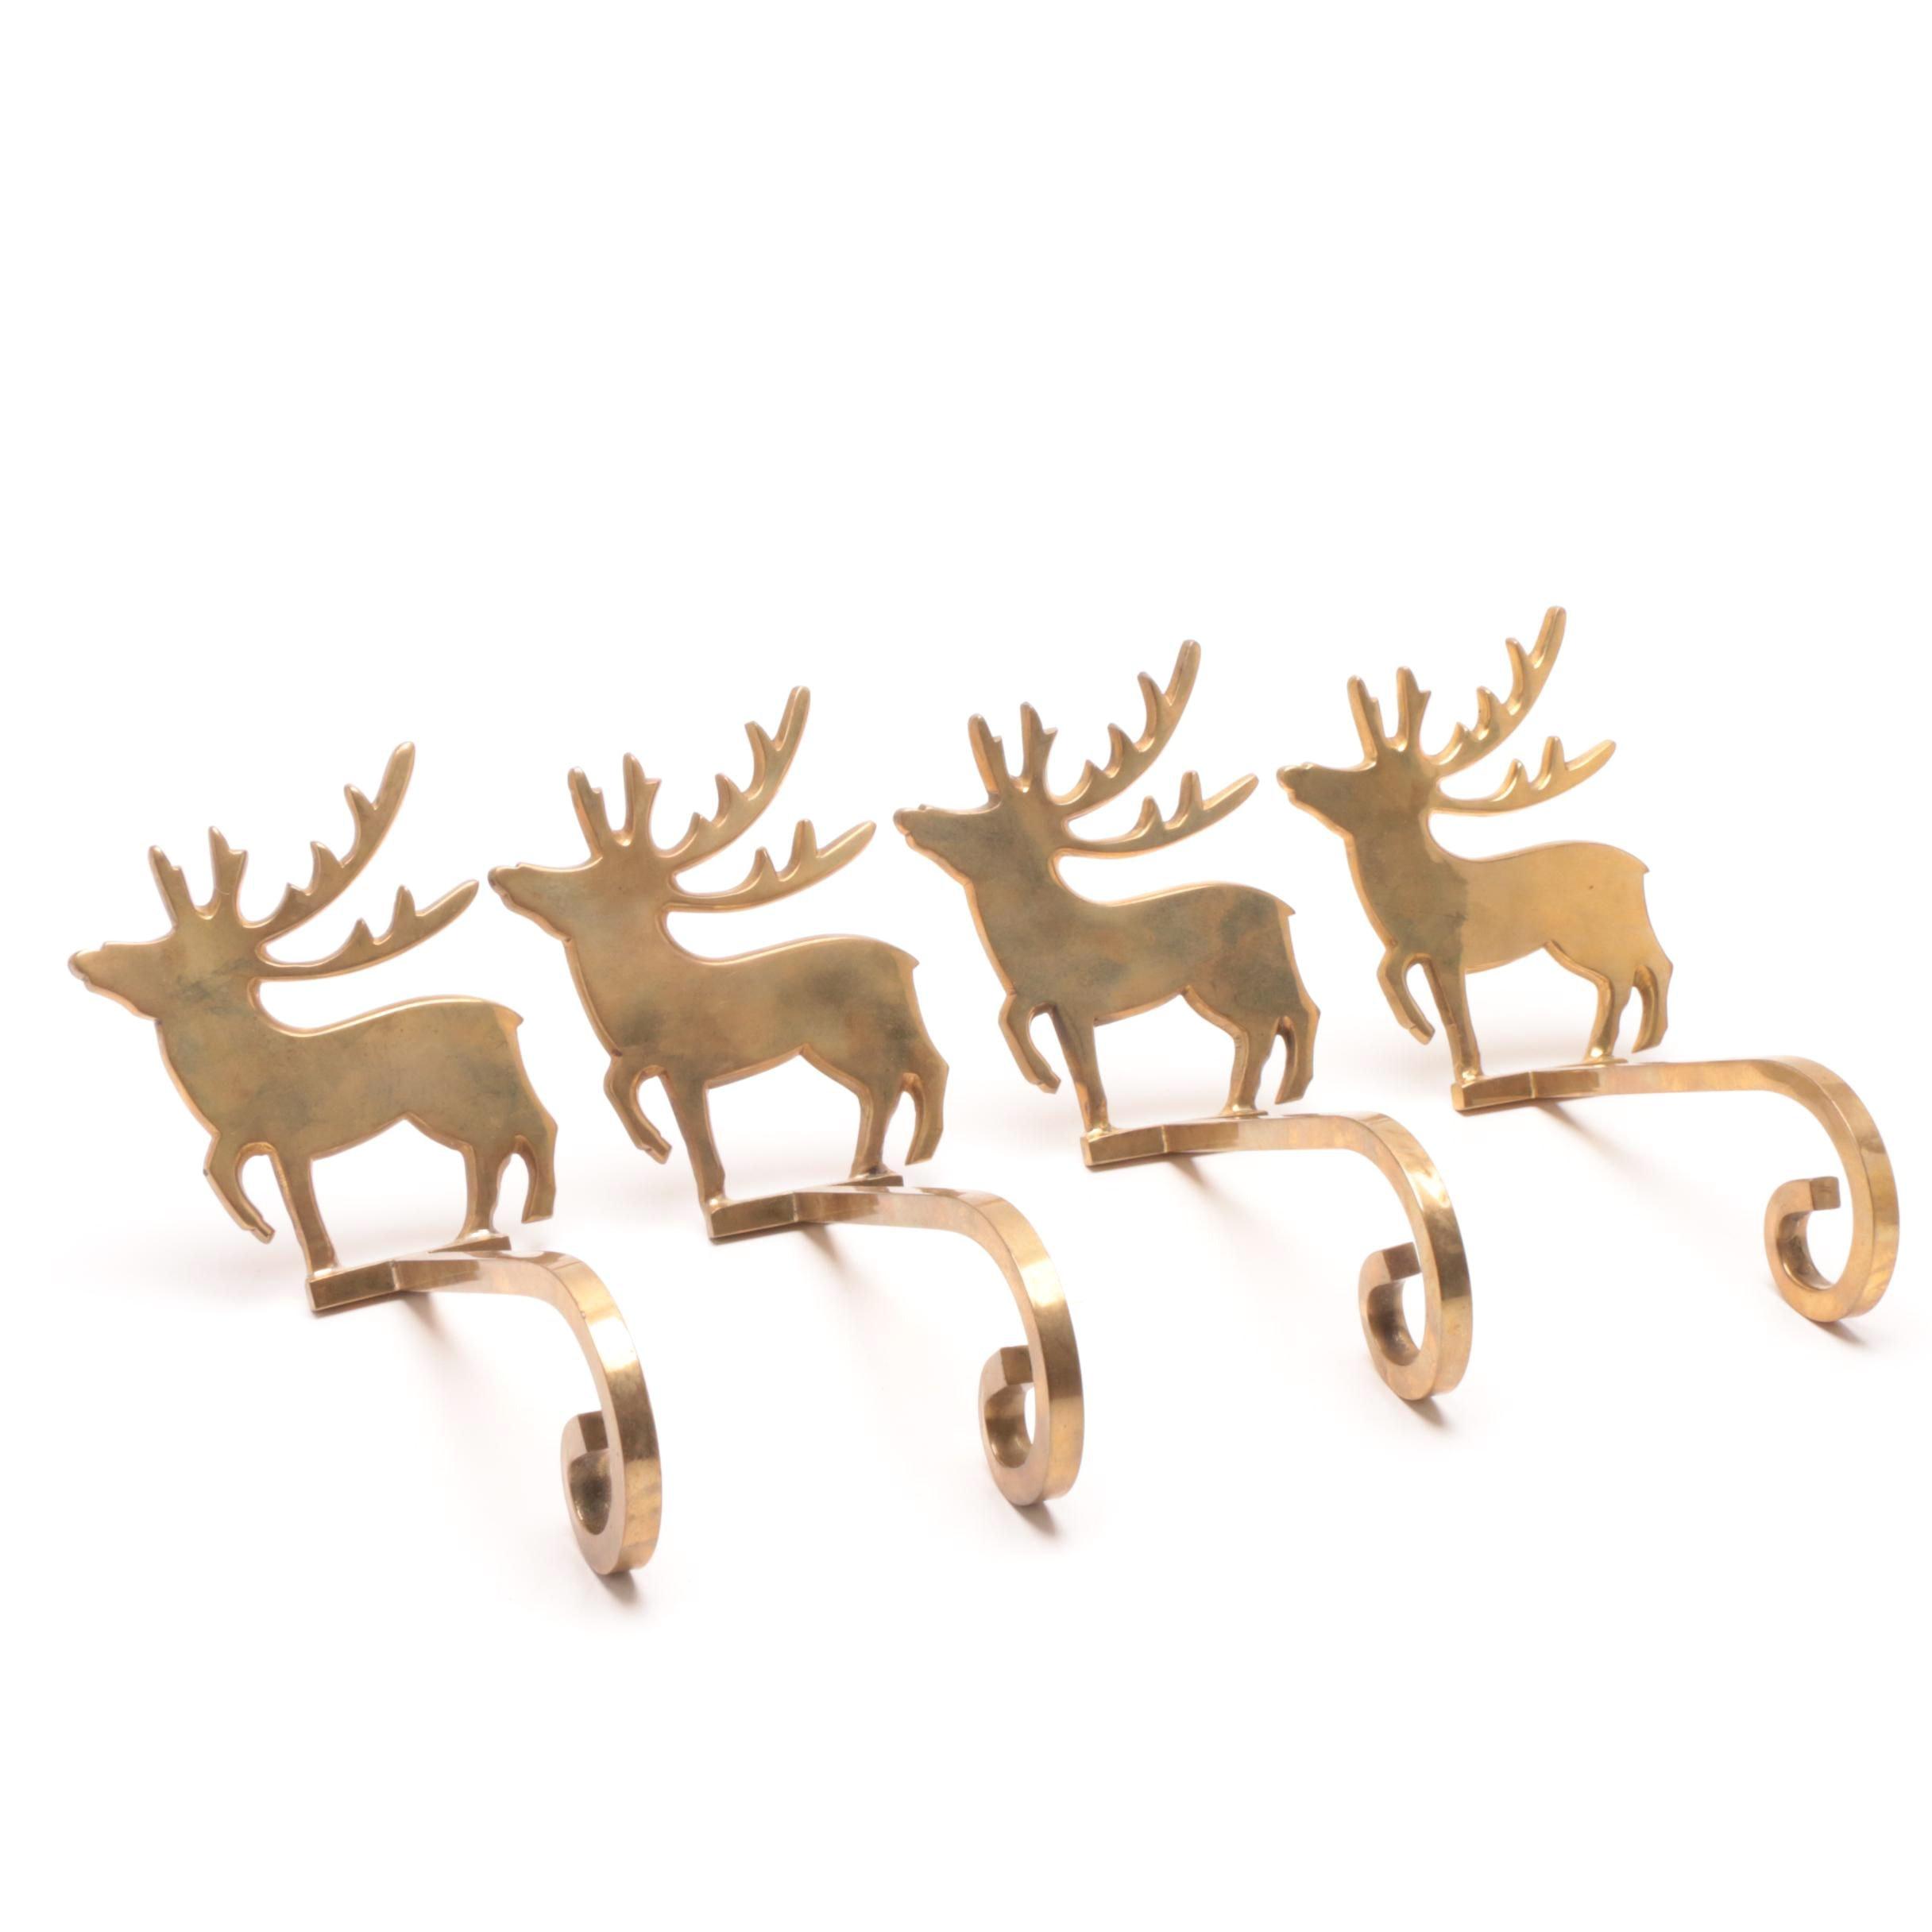 Brass Reindeer Stocking Holders